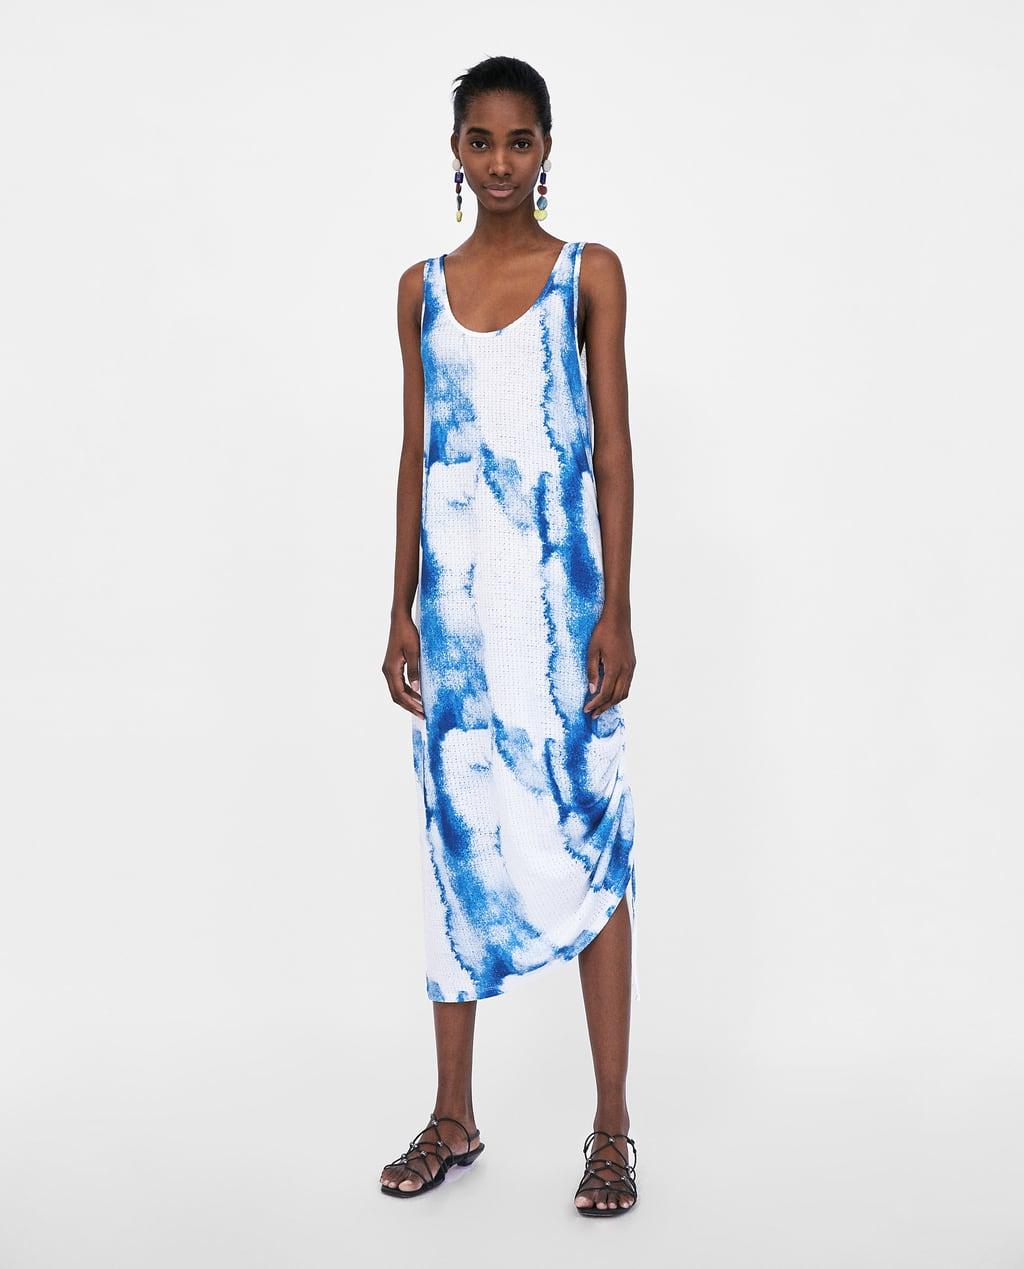 Tie dye shopping trend roundu best photo